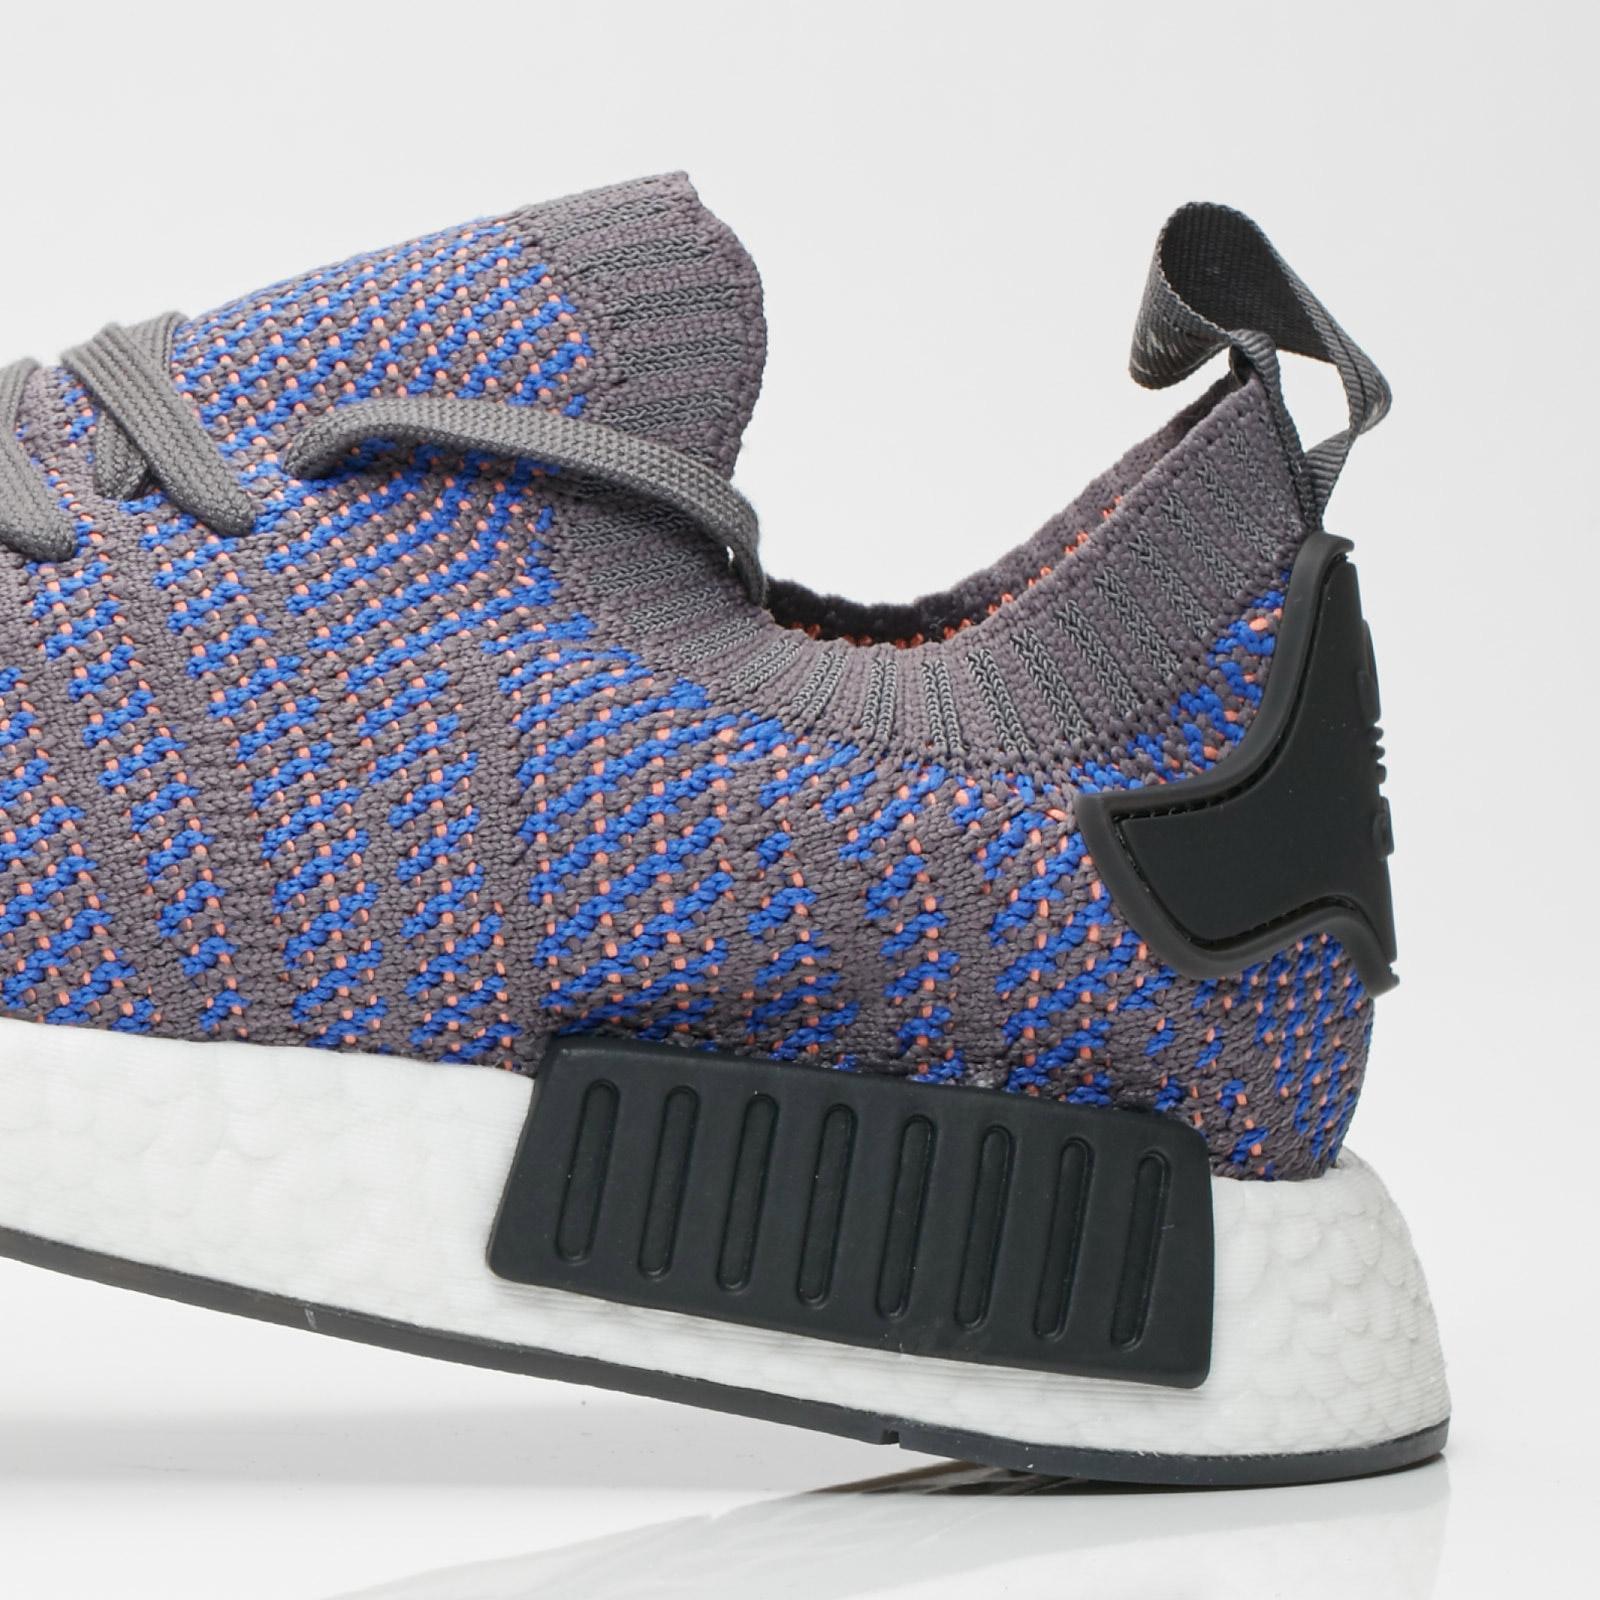 buy online 502f7 9605a adidas NMD R1 Stlt PK - Cq2388 - Sneakersnstuff | sneakers ...